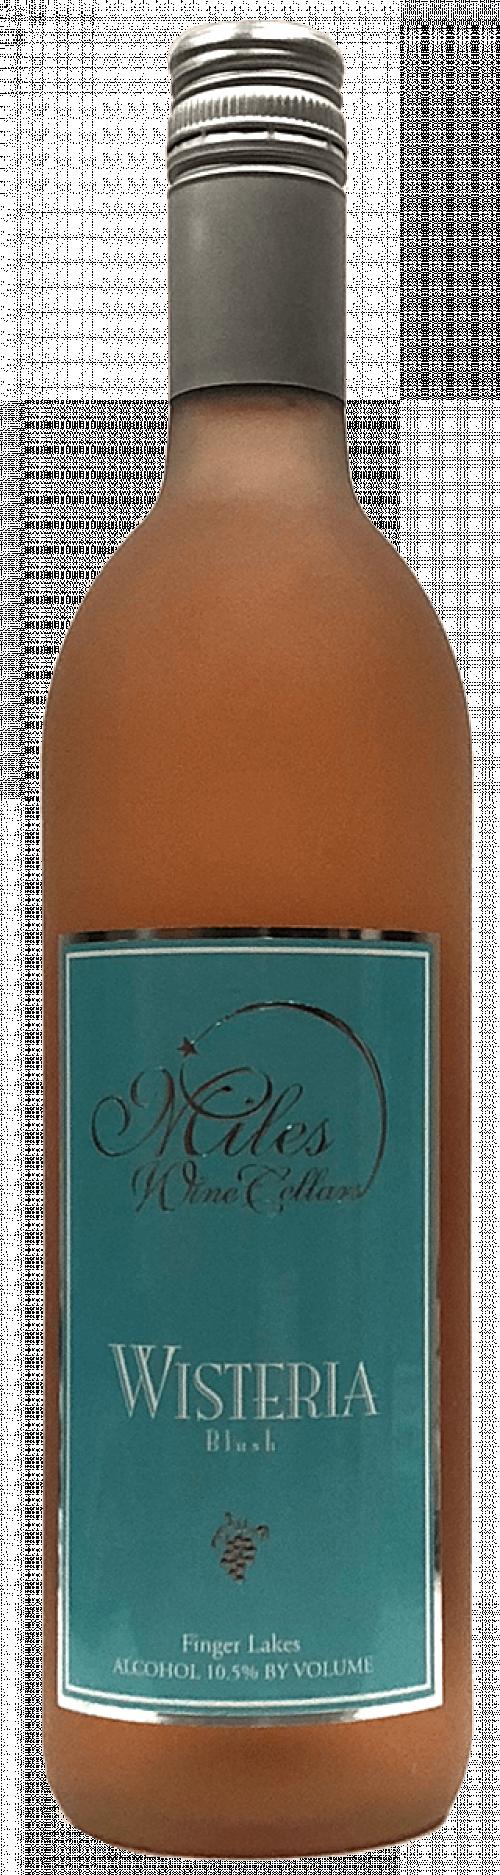 Miles Wine Cellars Wisteria Blush 750Ml NV